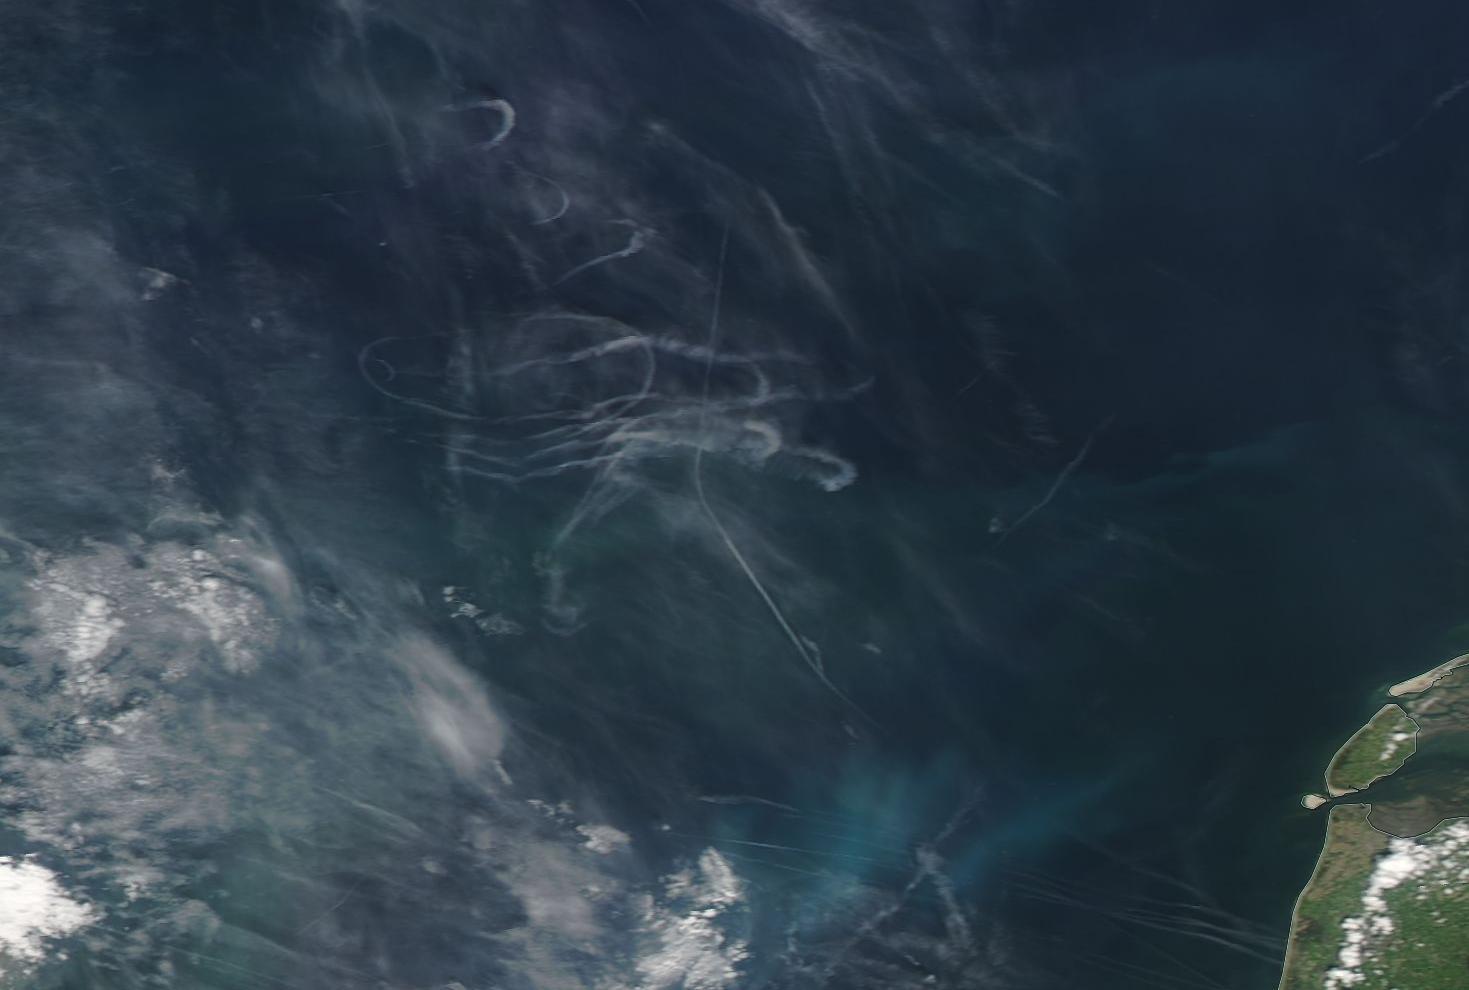 circles of chemtrail on NASA sat image 17 July 2019 https://go.nasa.gov/2JGhH5P